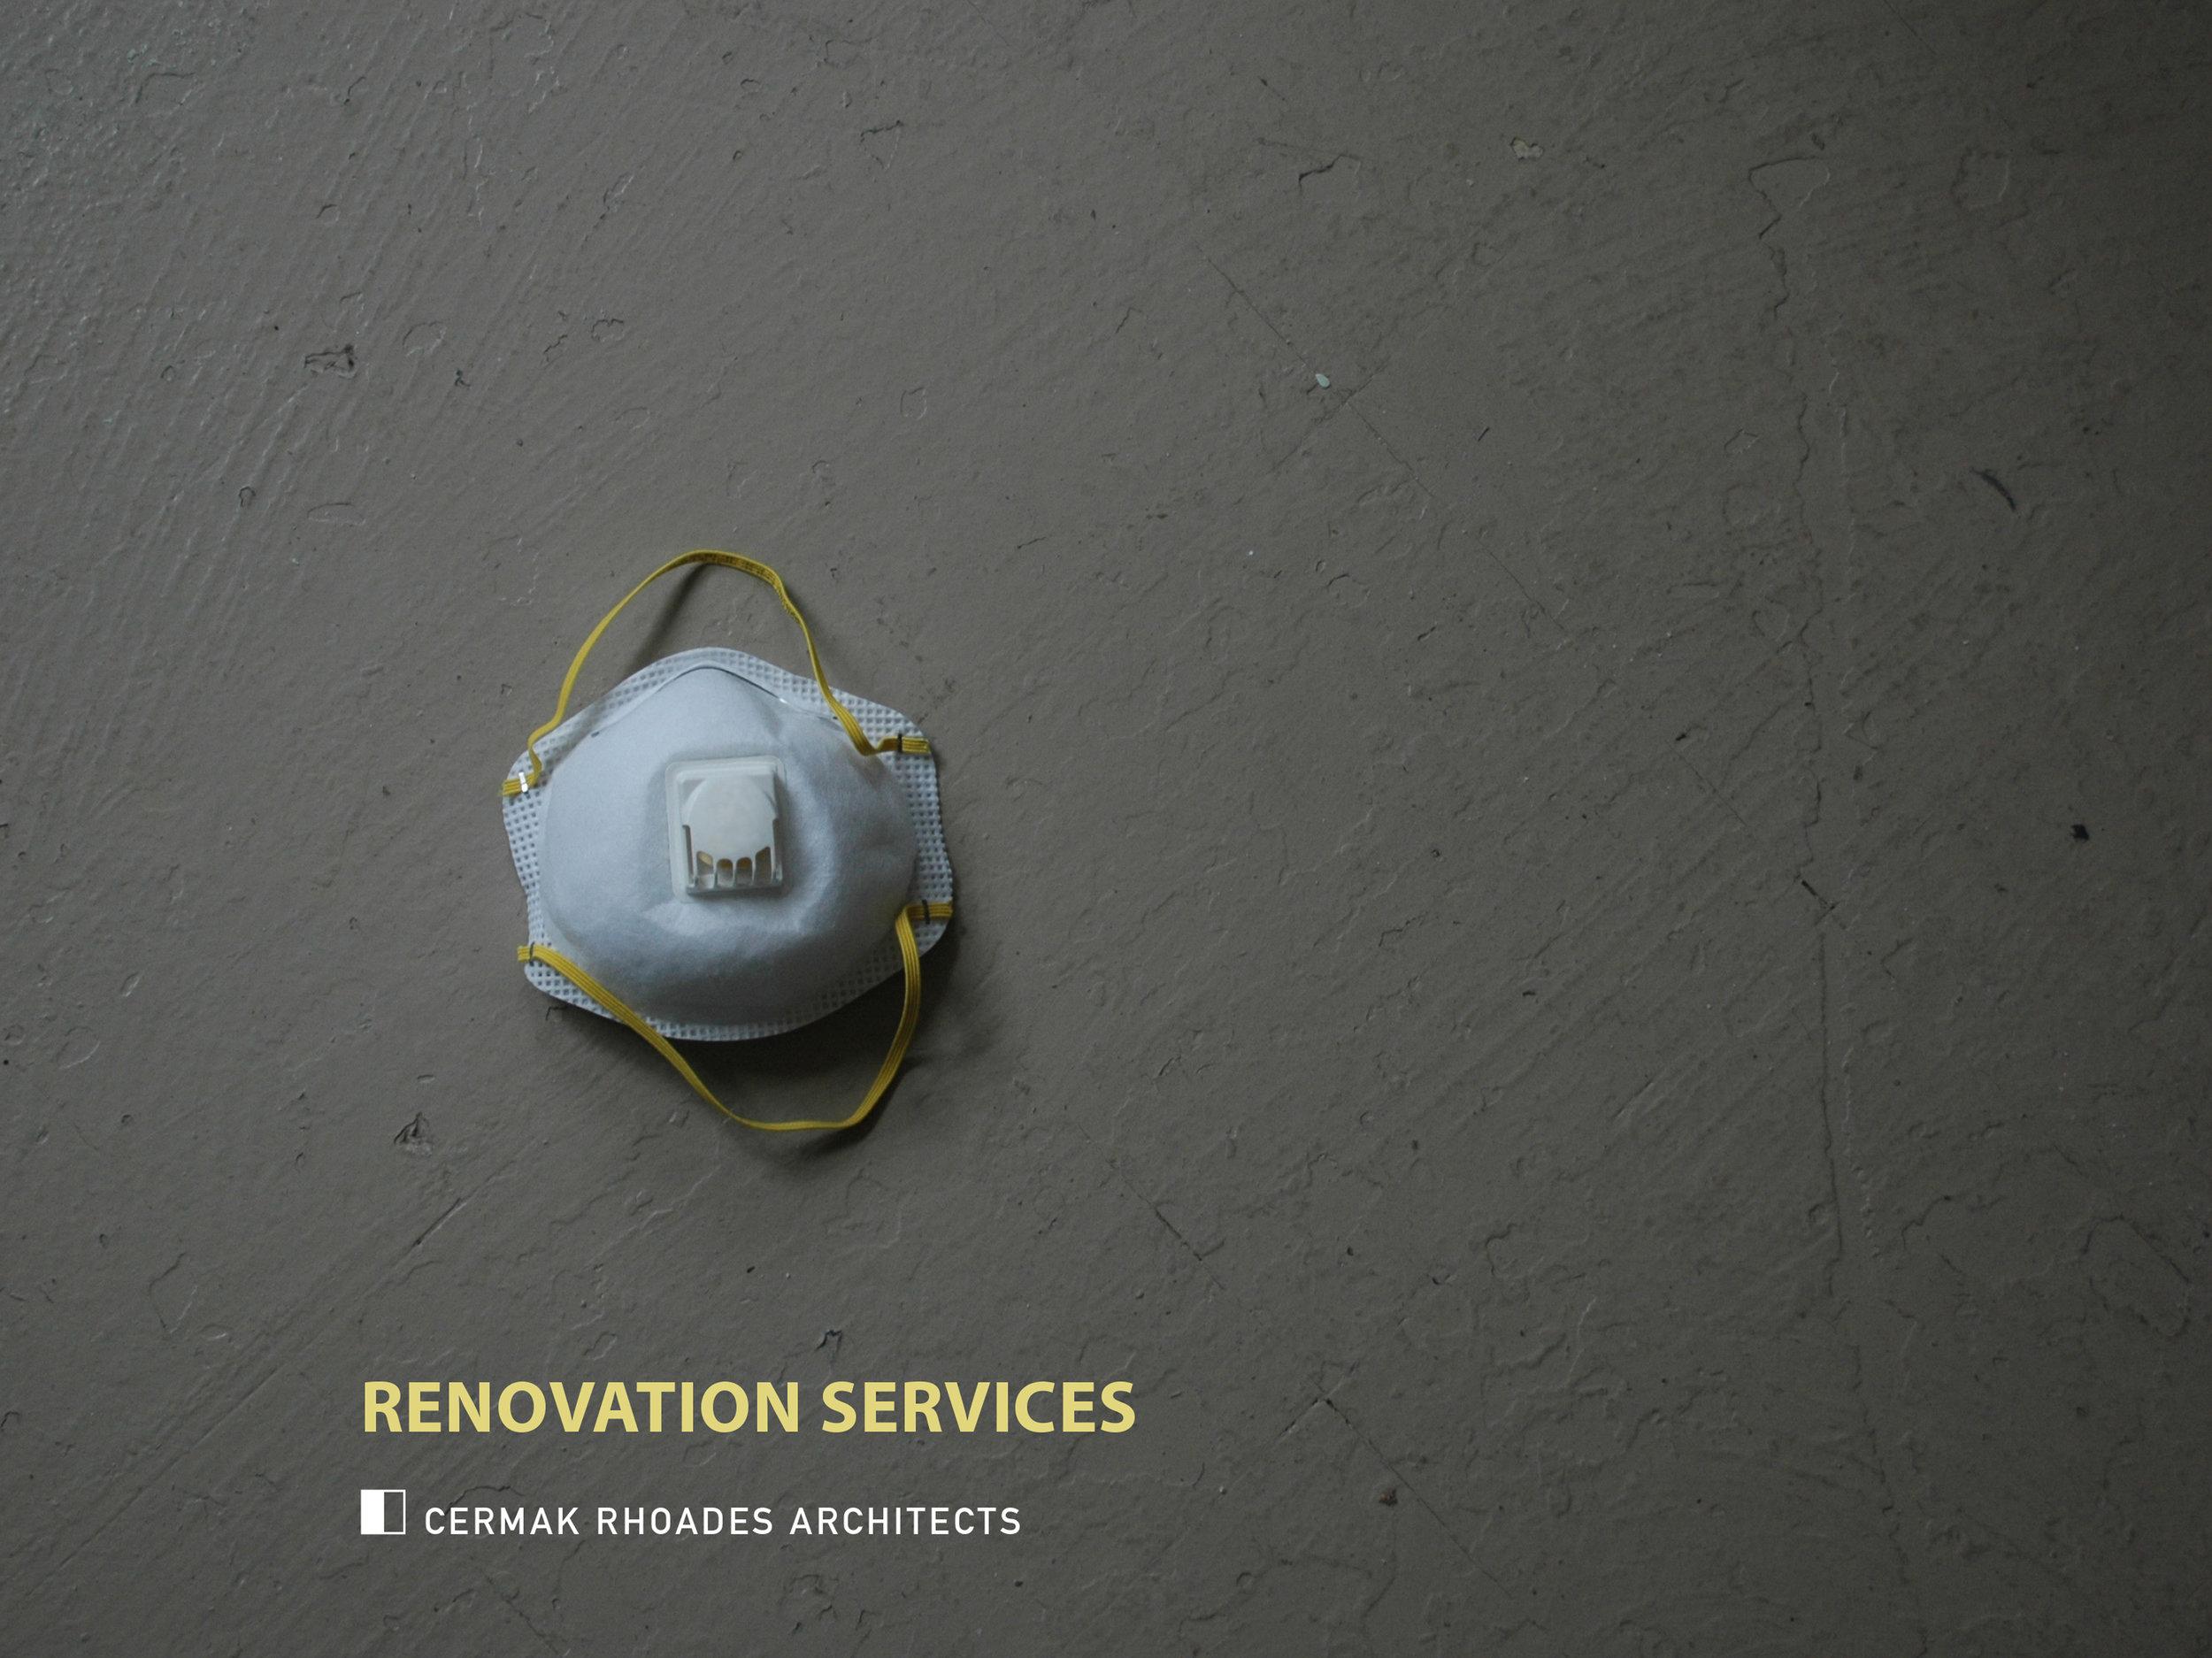 CRA-Renovation-Serv-print-version 1.jpg